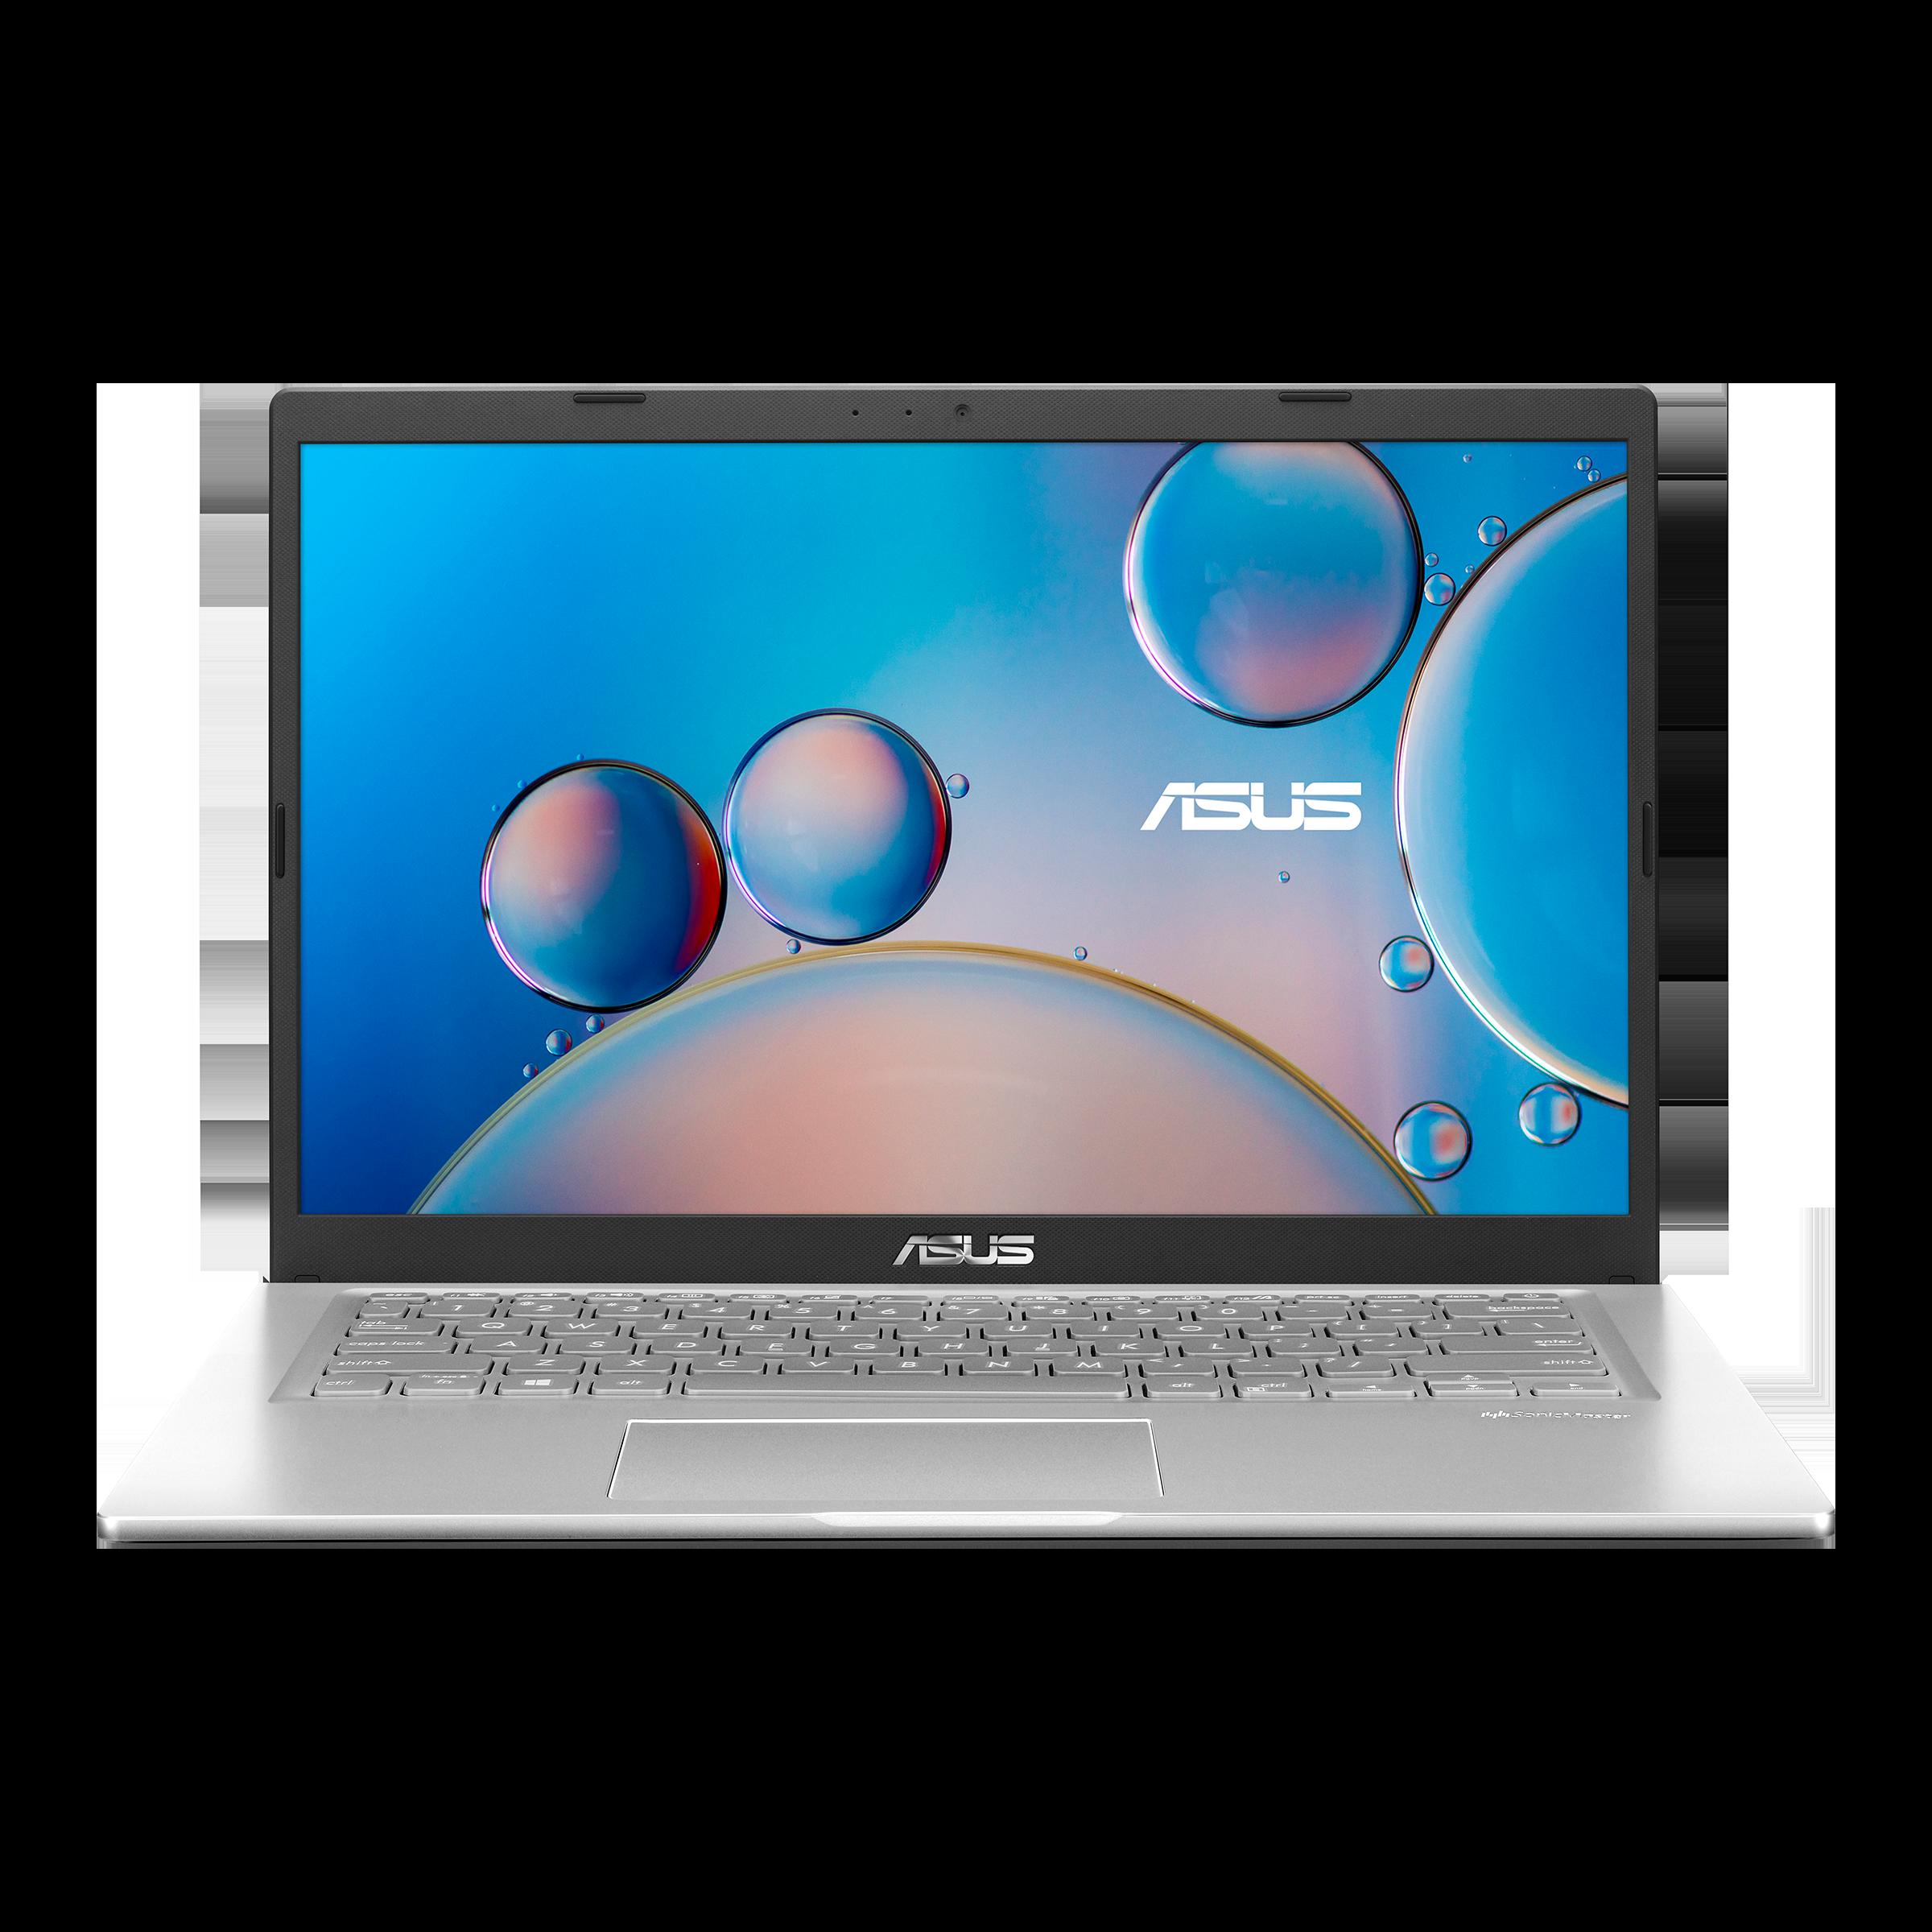 ASUS VivoBook 14 X415 laptop, silver